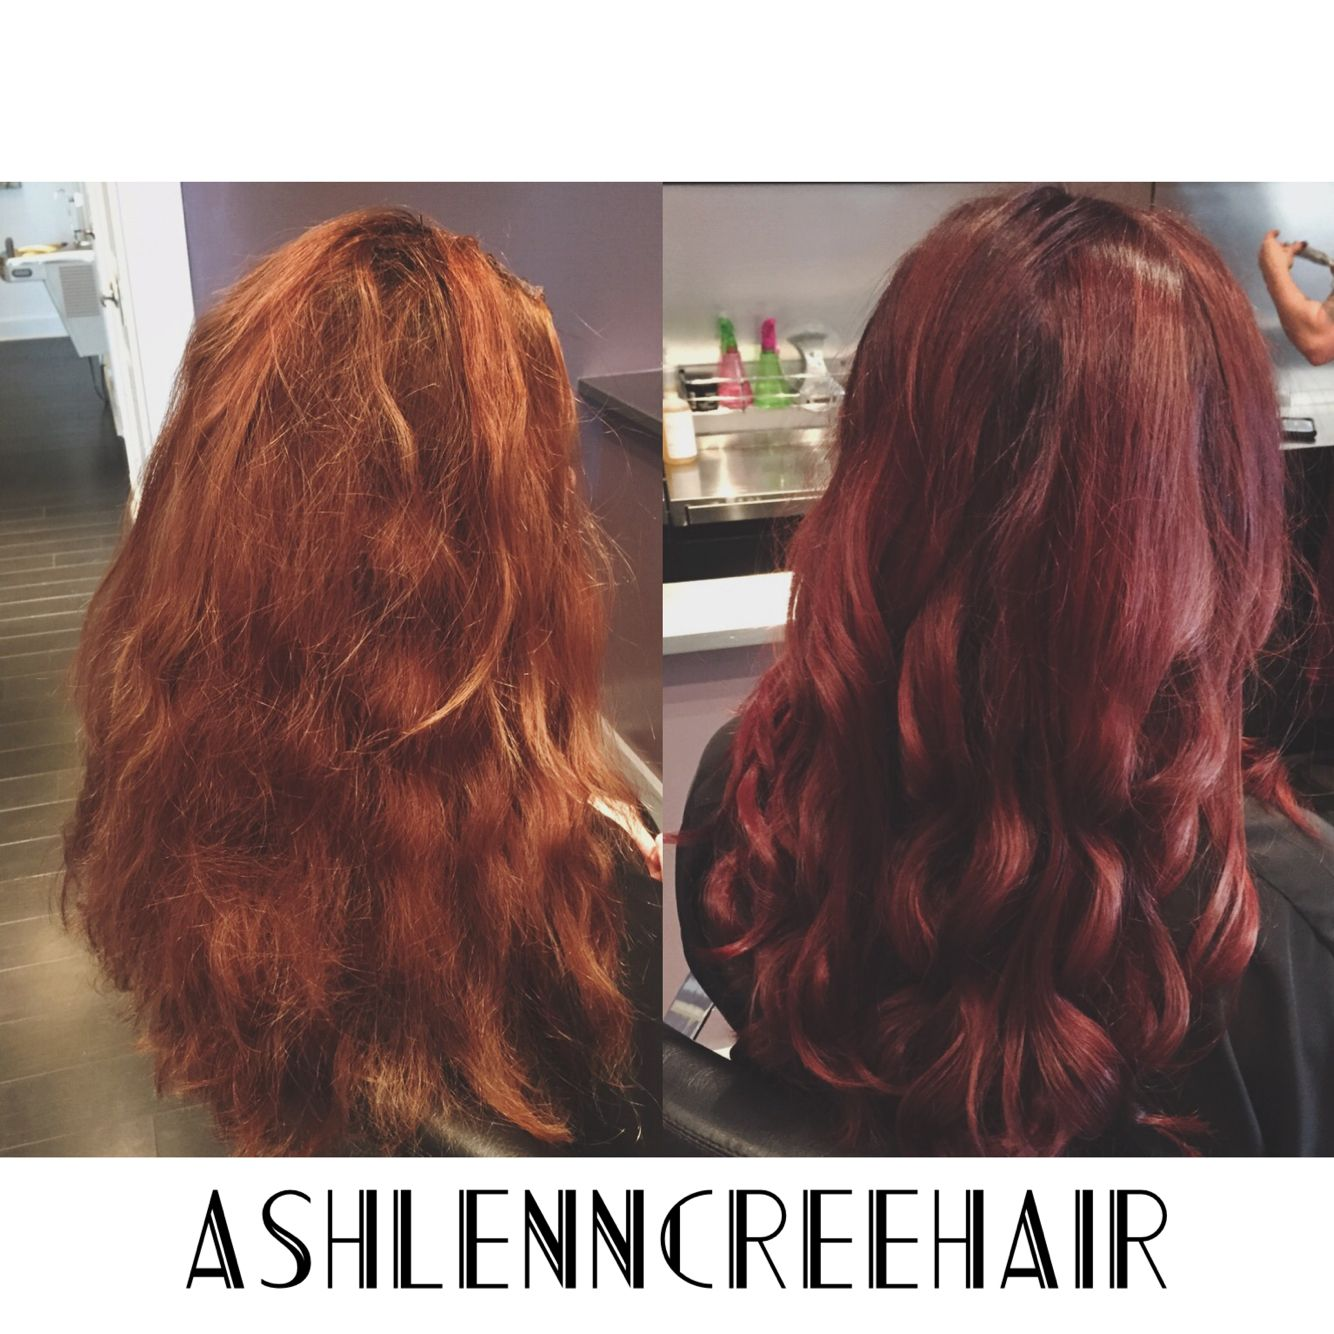 Jaclyn Hill inspired hair